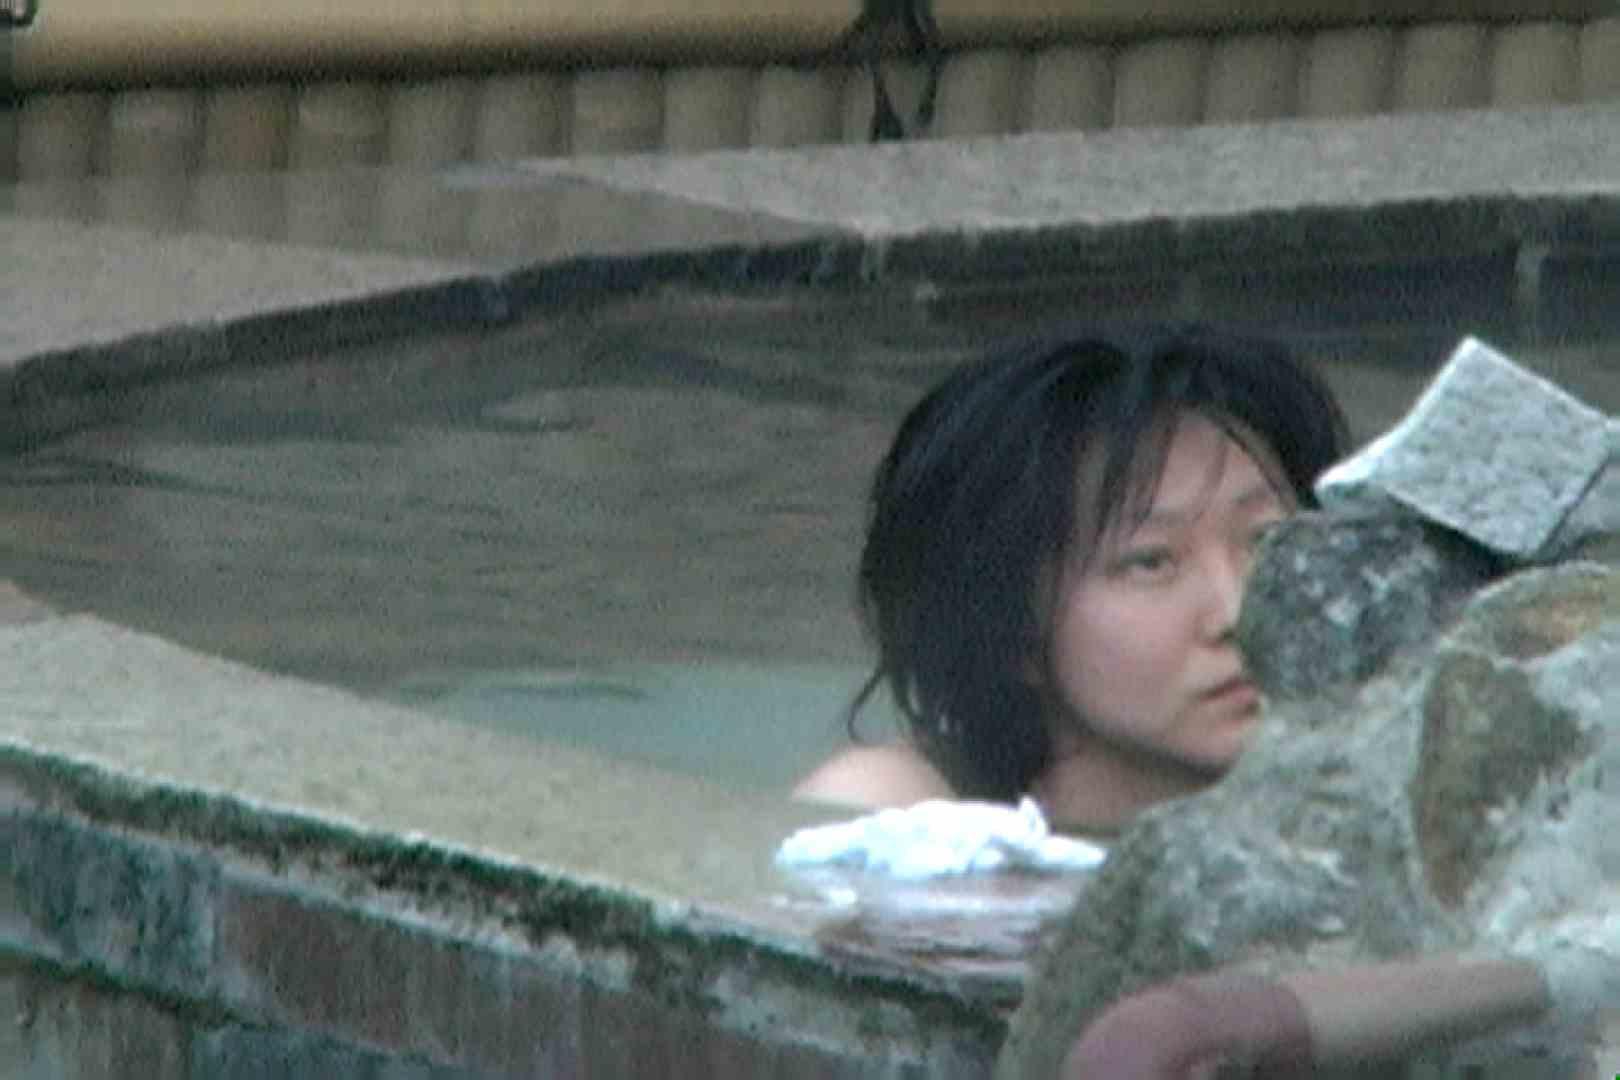 Aquaな露天風呂Vol.649 0  102連発 88